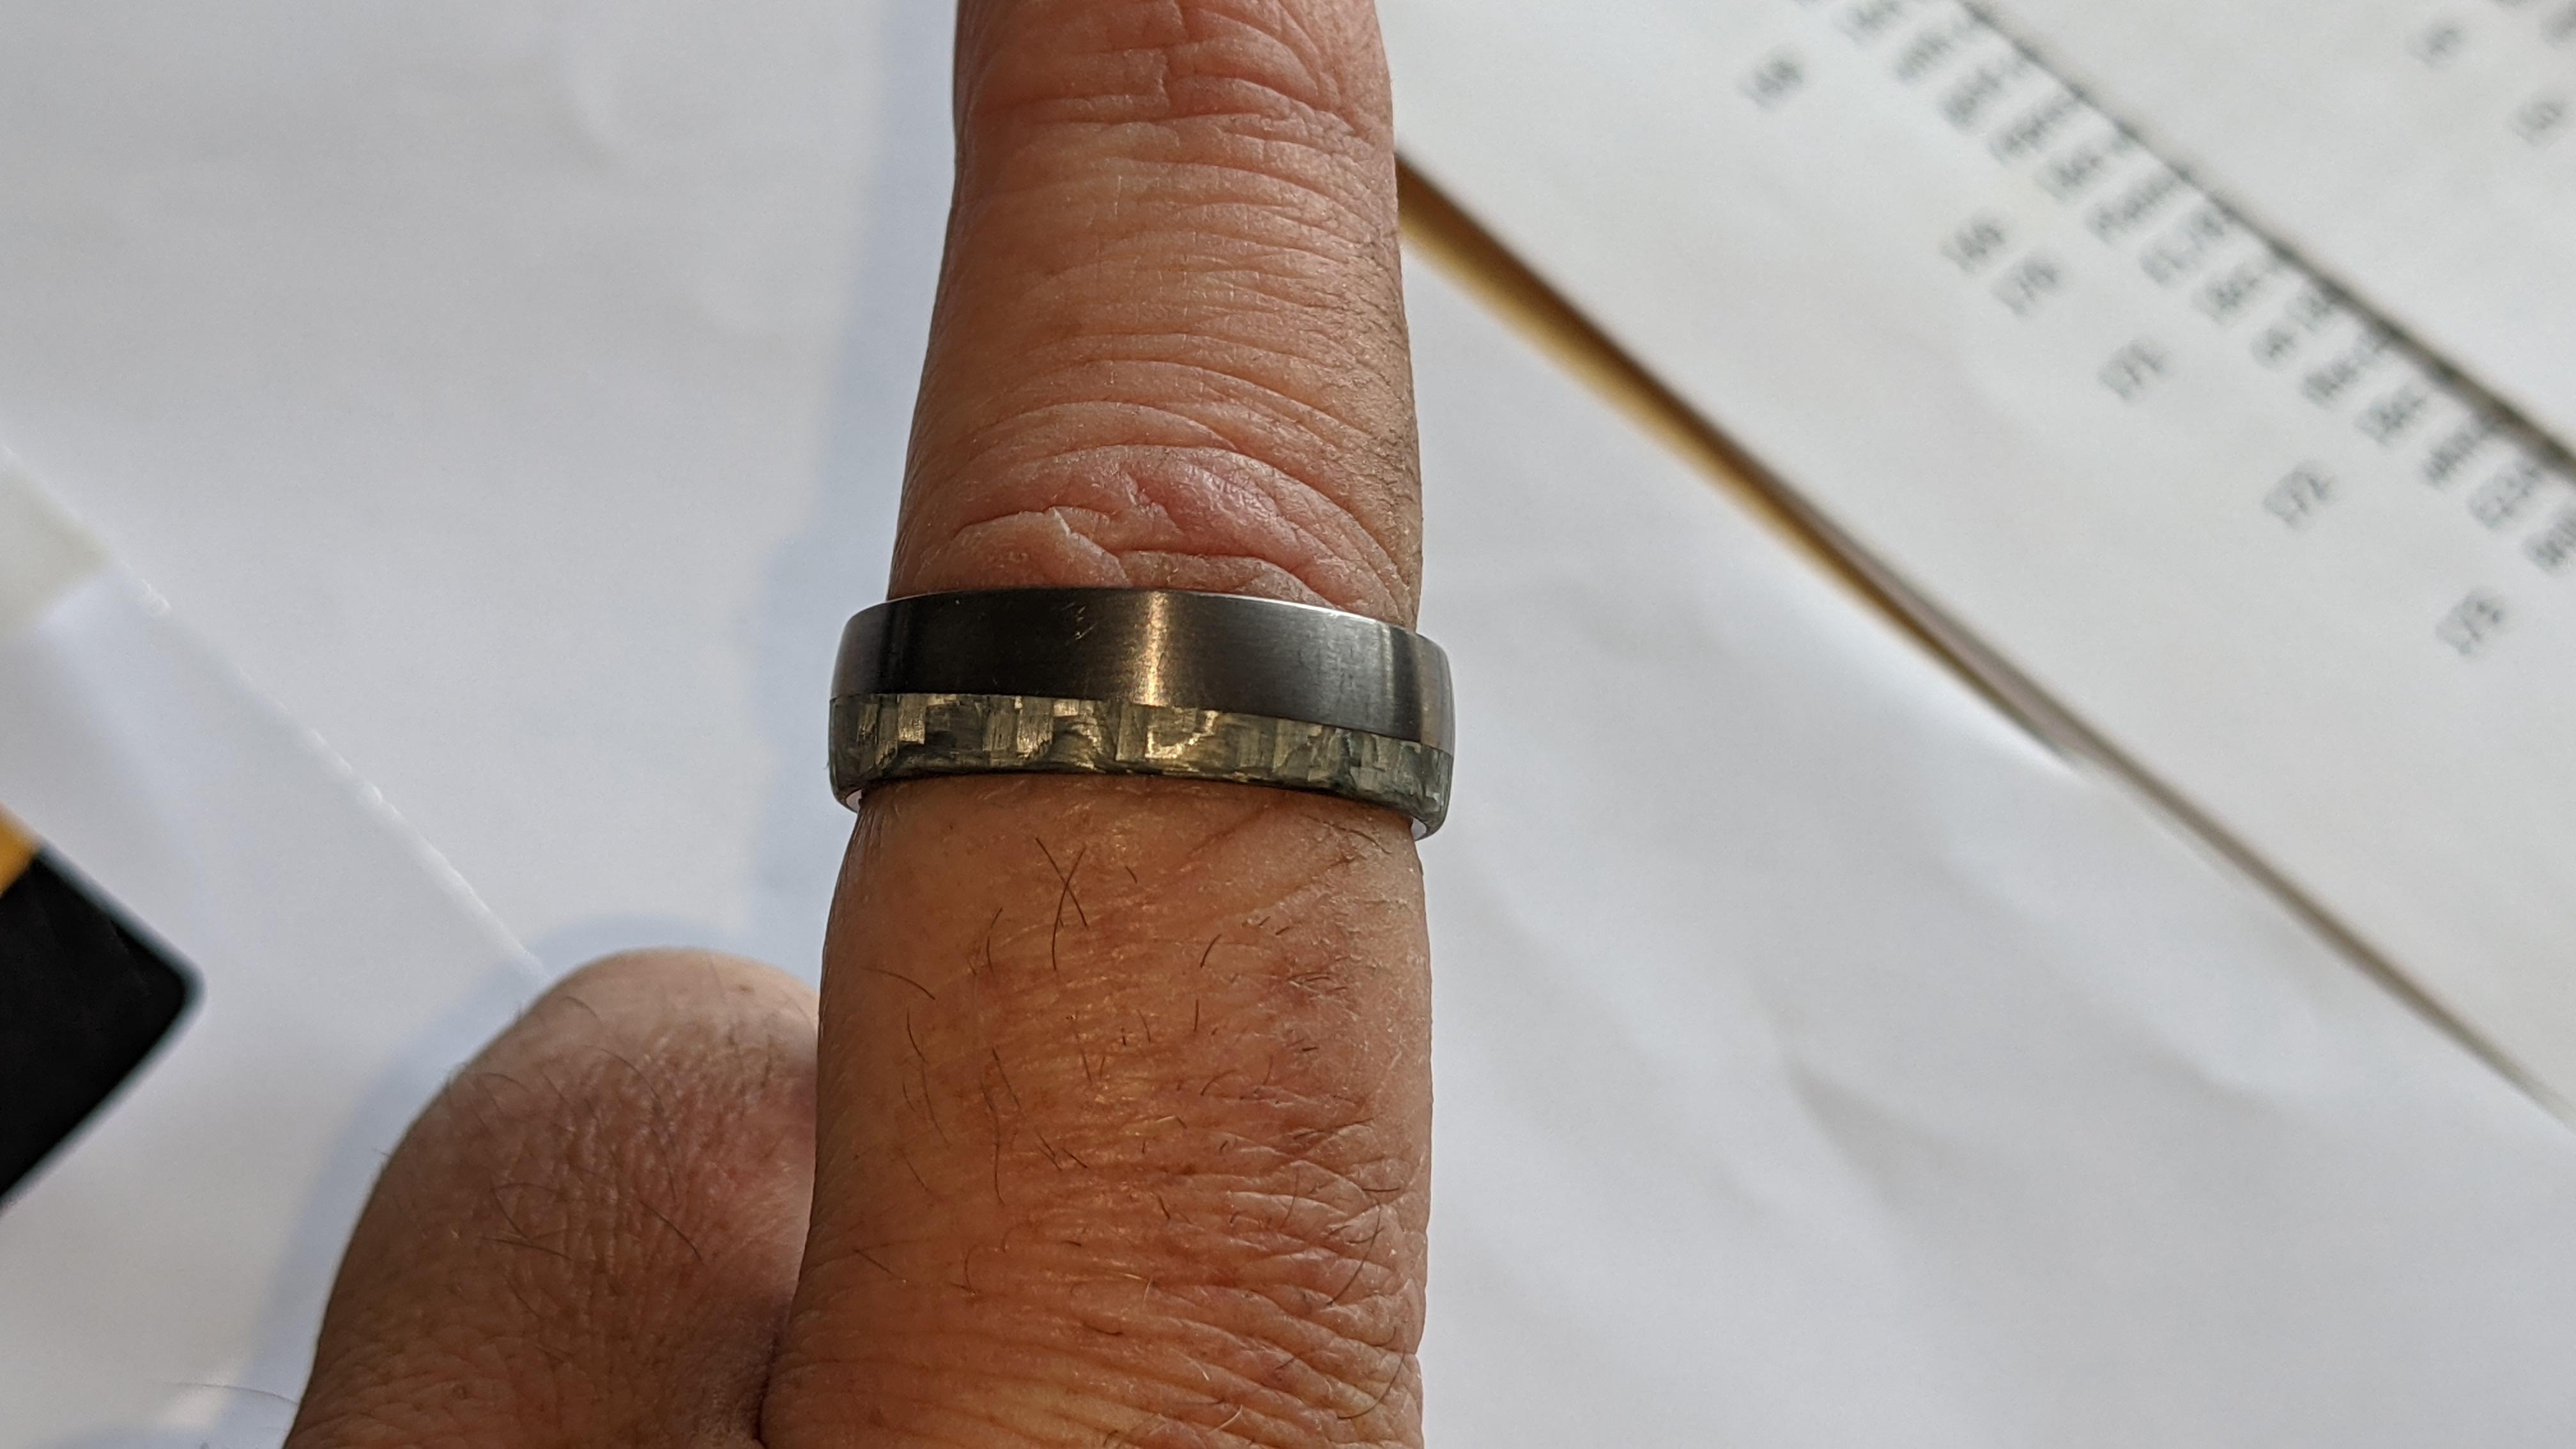 Tantalum & carbon ring RRP £600 - Image 12 of 13